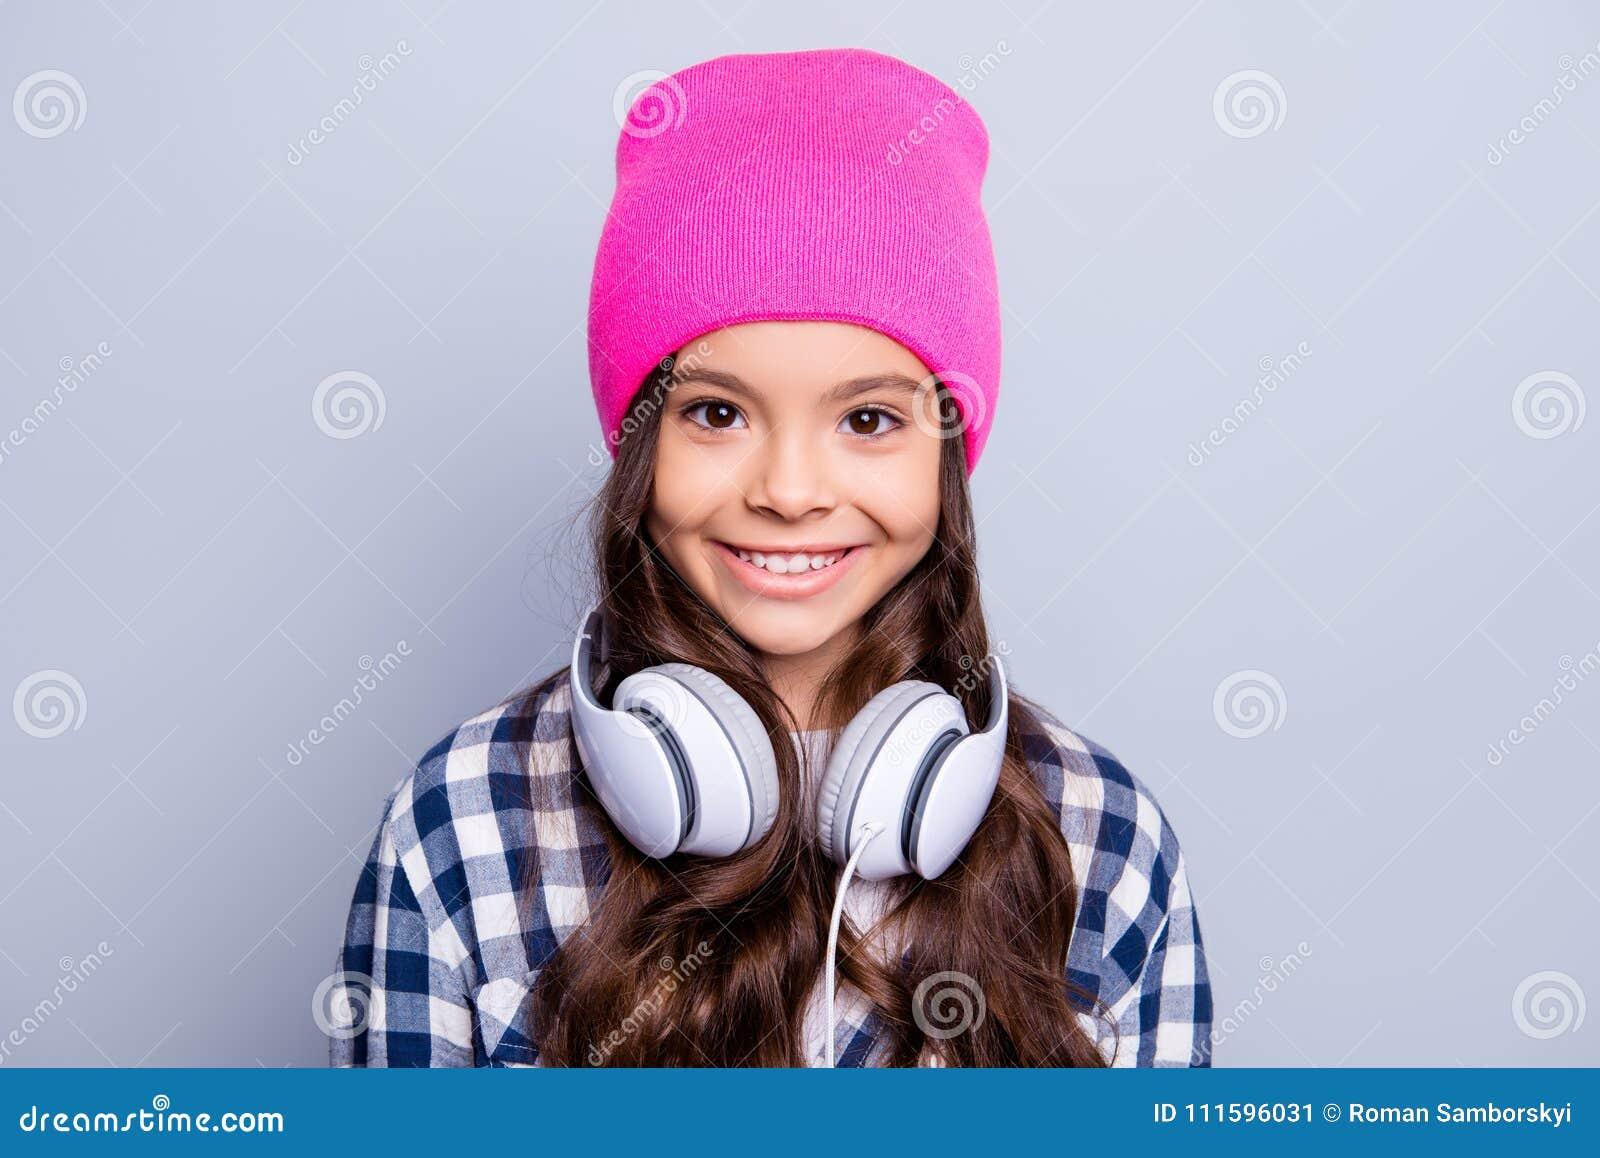 Close up portrait of cute charming little girl having earphones